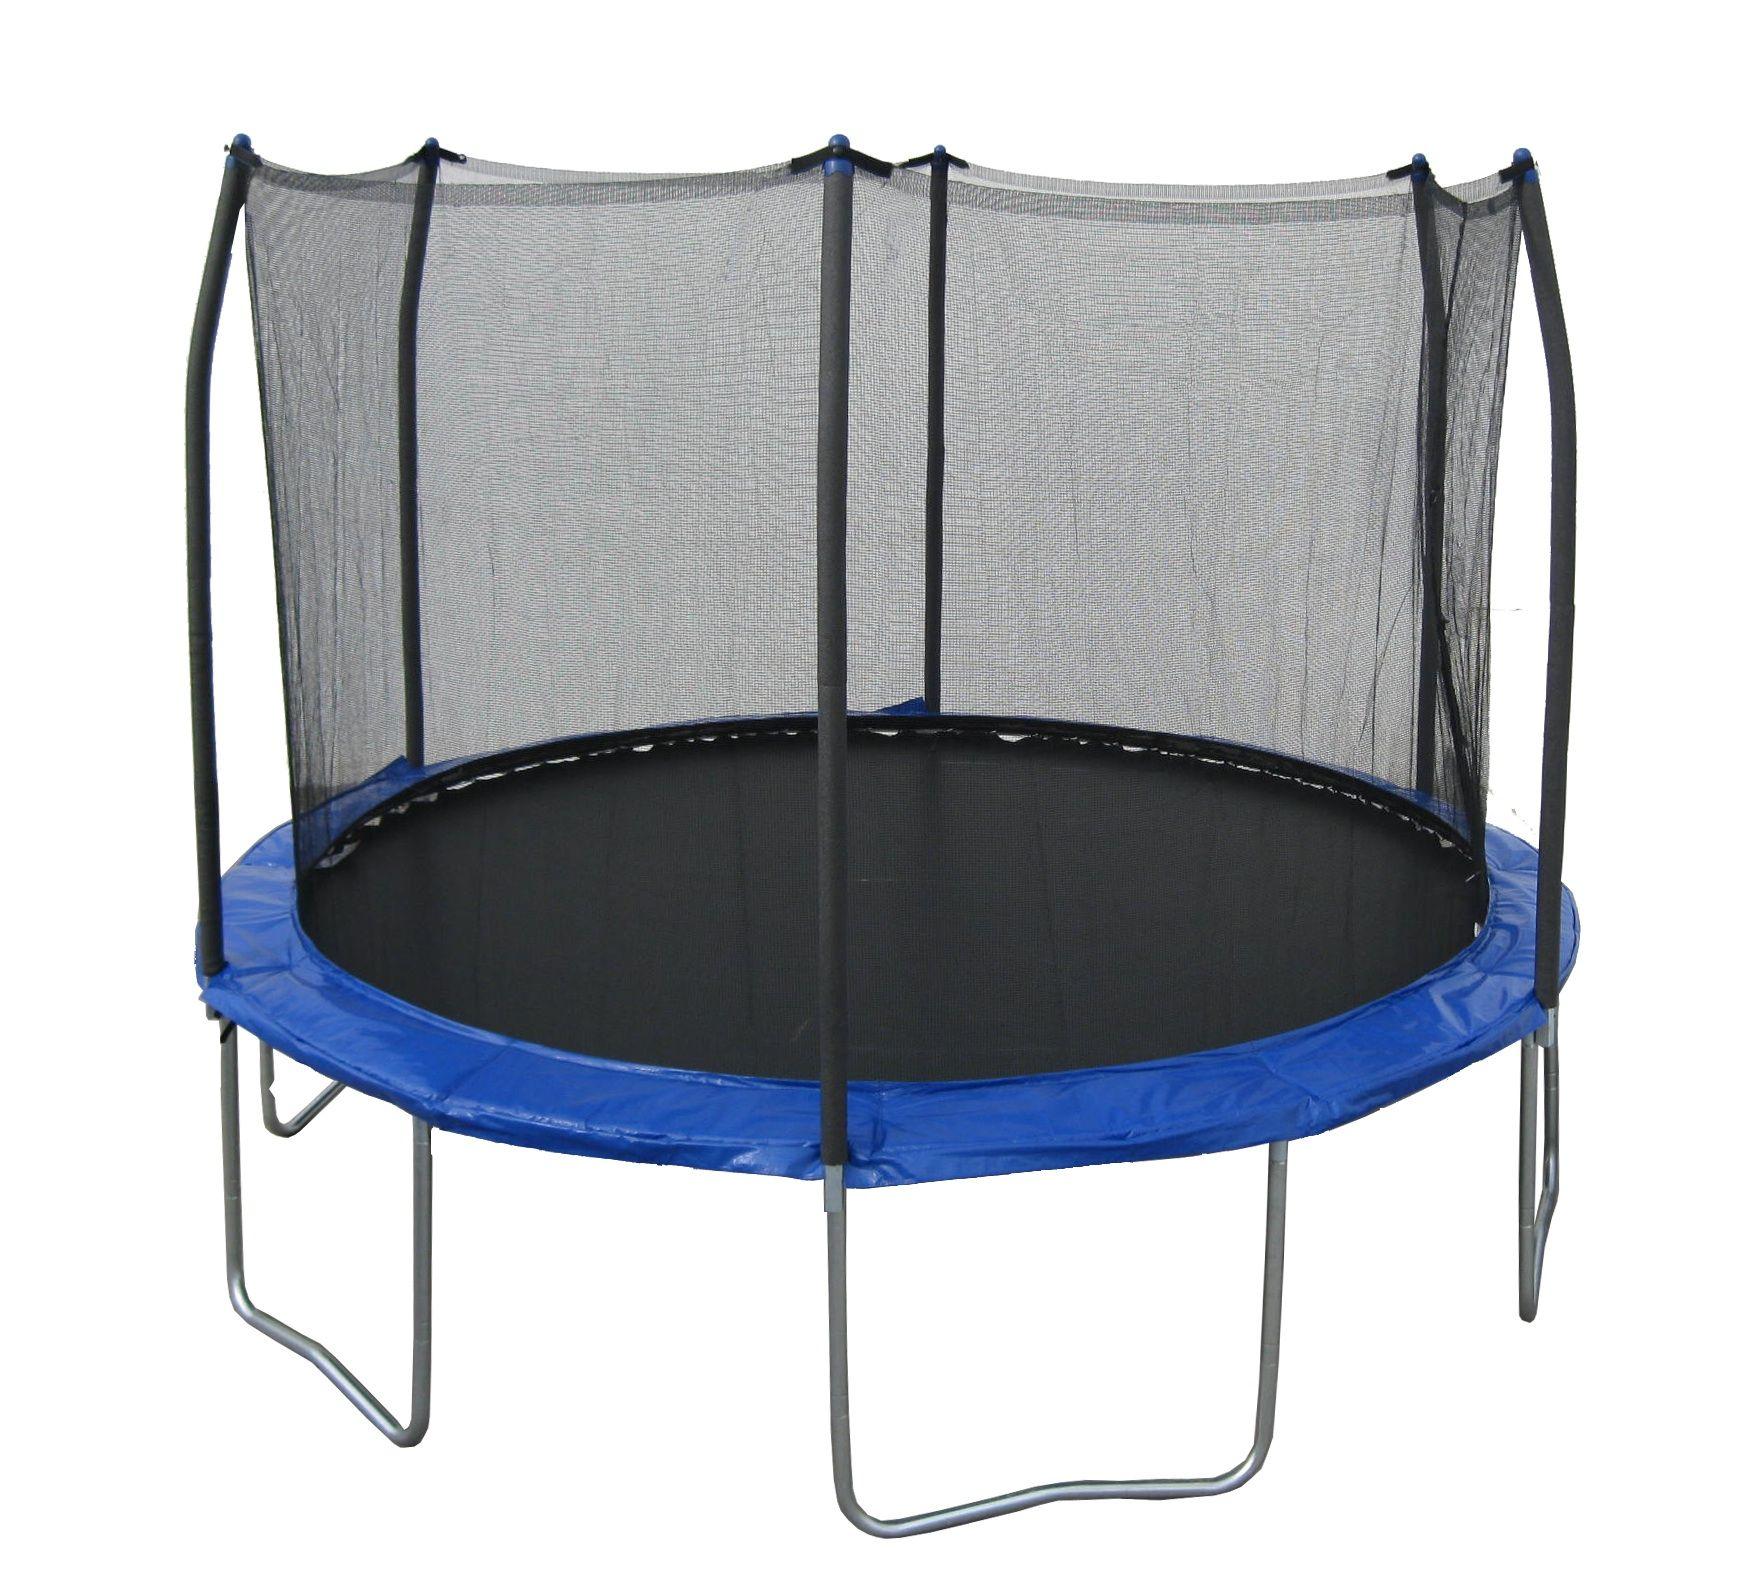 Blue Trampoline $180 Amazon Giveaway!